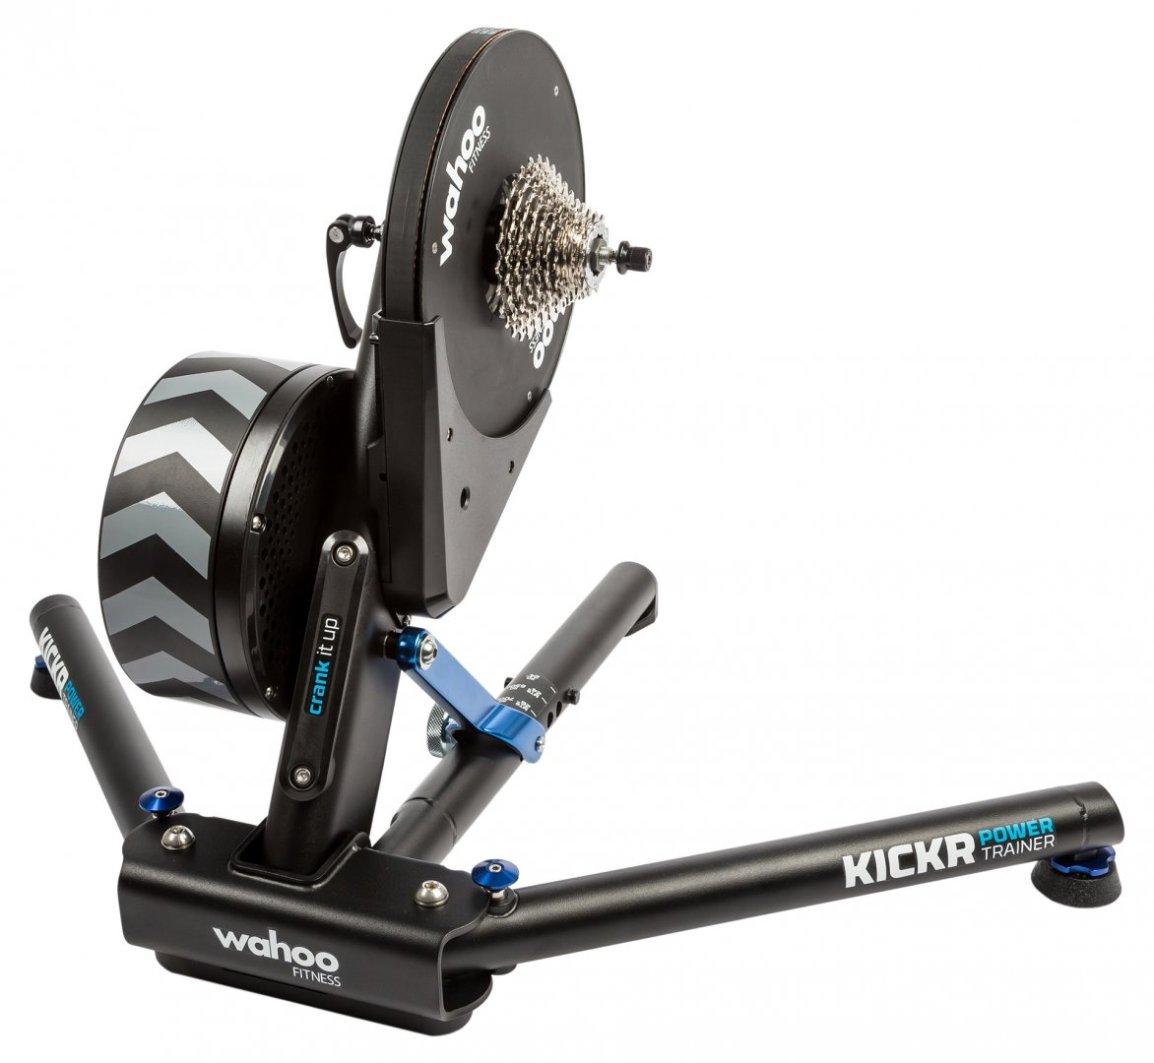 Wahoo-KICKR-Power-Trainer-Trainingsrolle-schwarz-u-590d287c60d74f55e2c26bac98160676